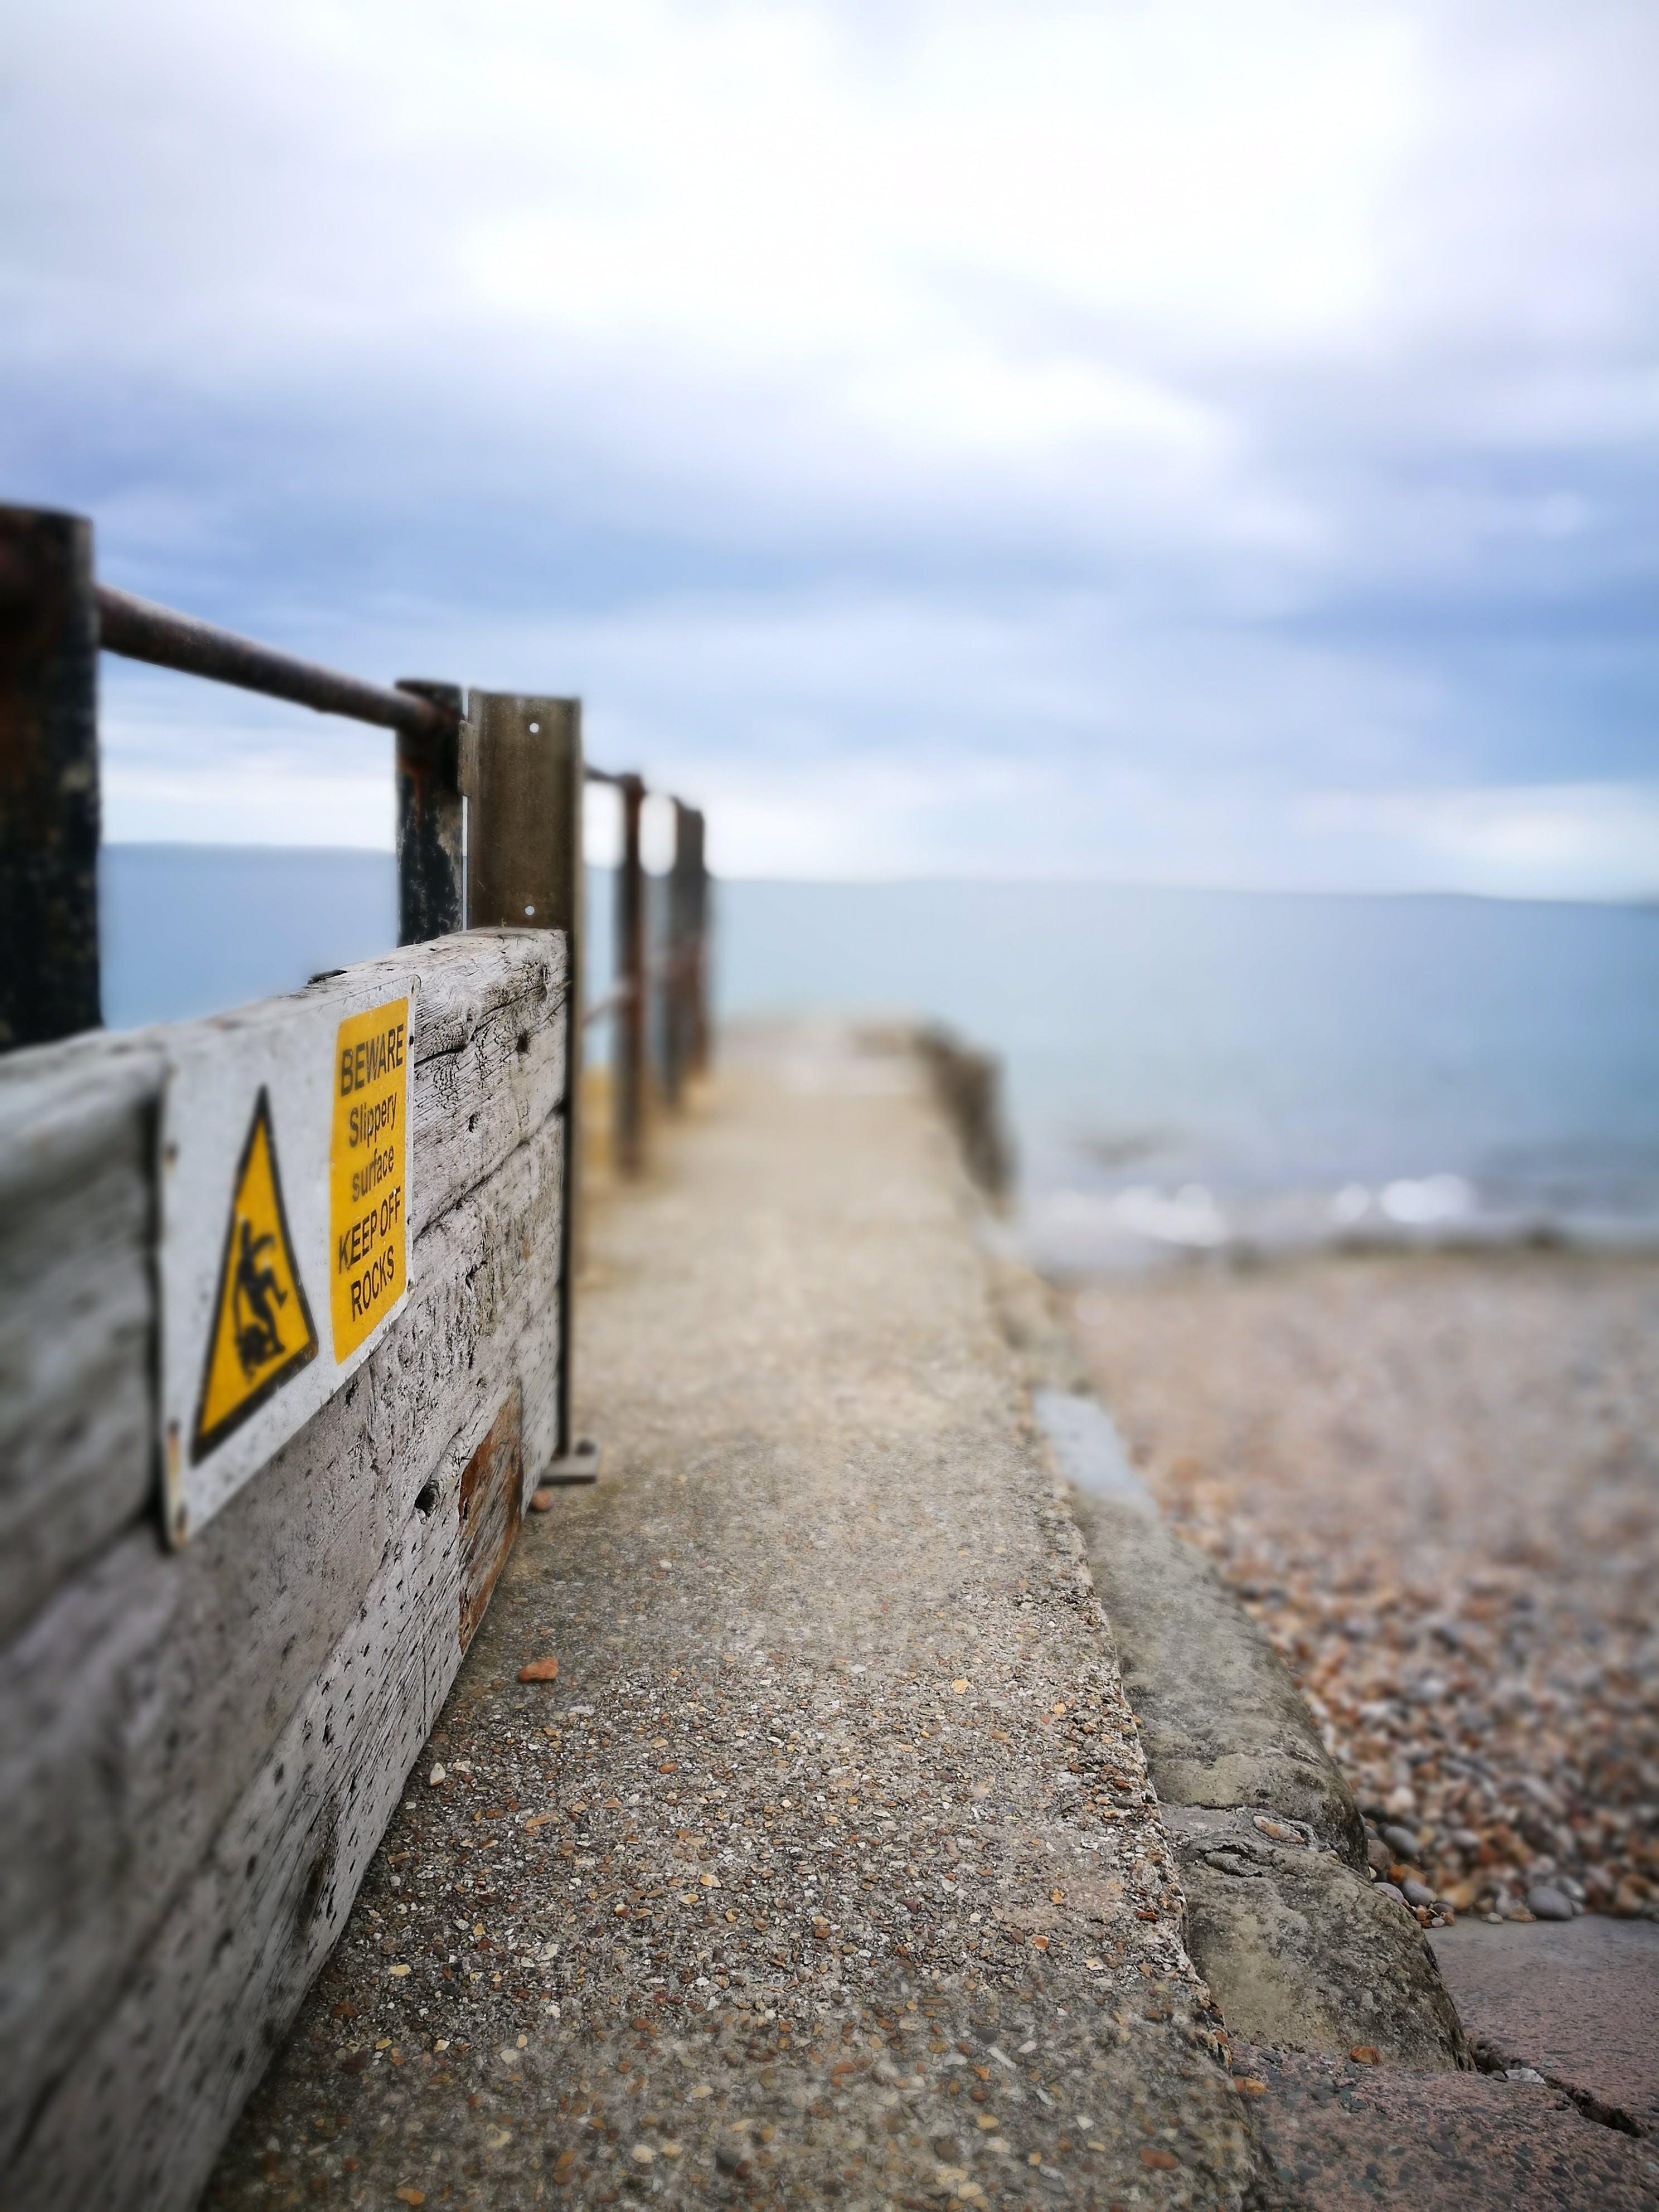 Free stock photo of sea, road, landscape, sky